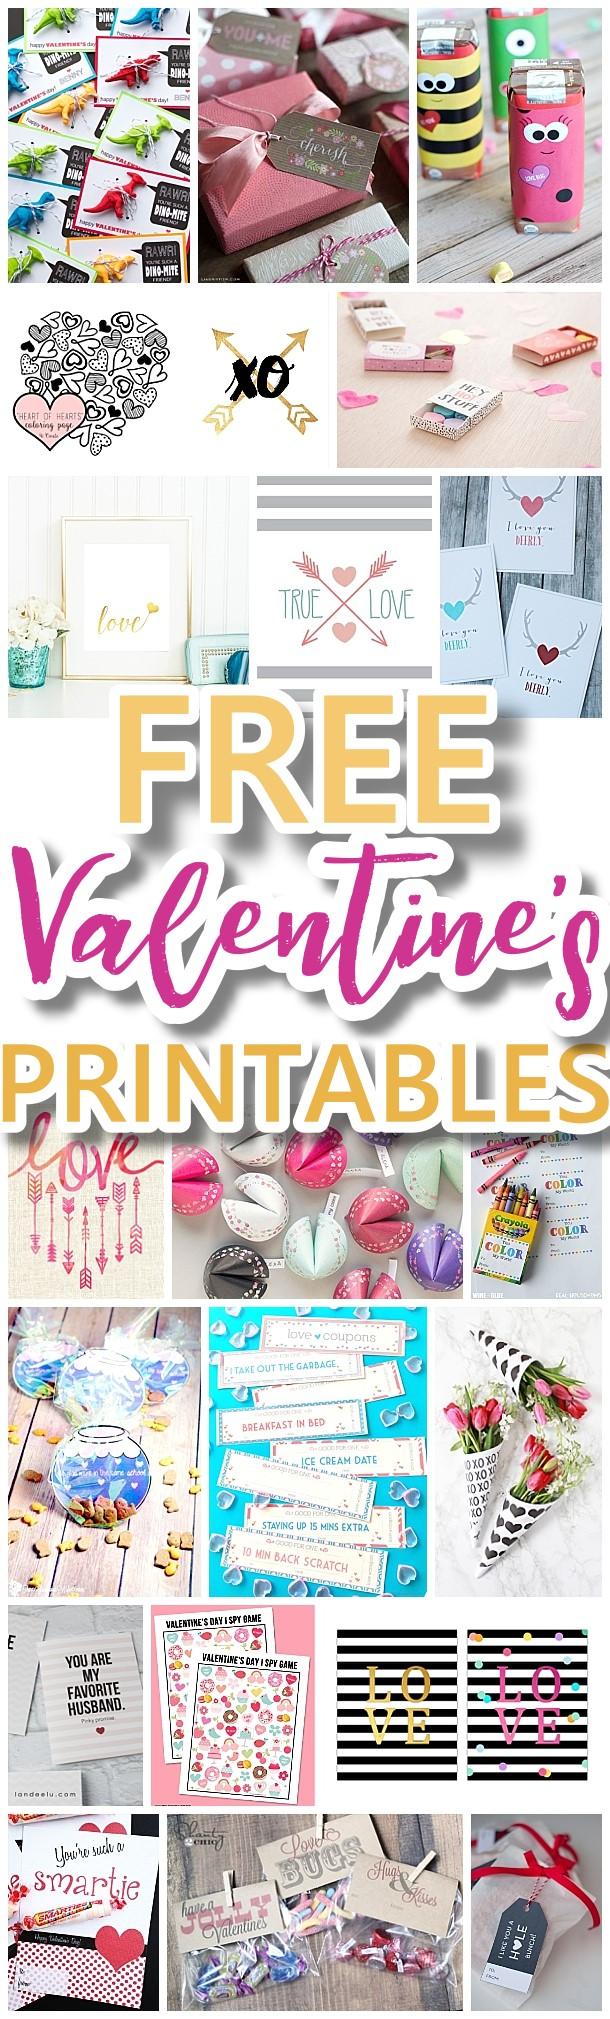 The BEST Valentine's Day FREE Printables - Kids Classmate ... Free Printable Valentine's Day Decorations